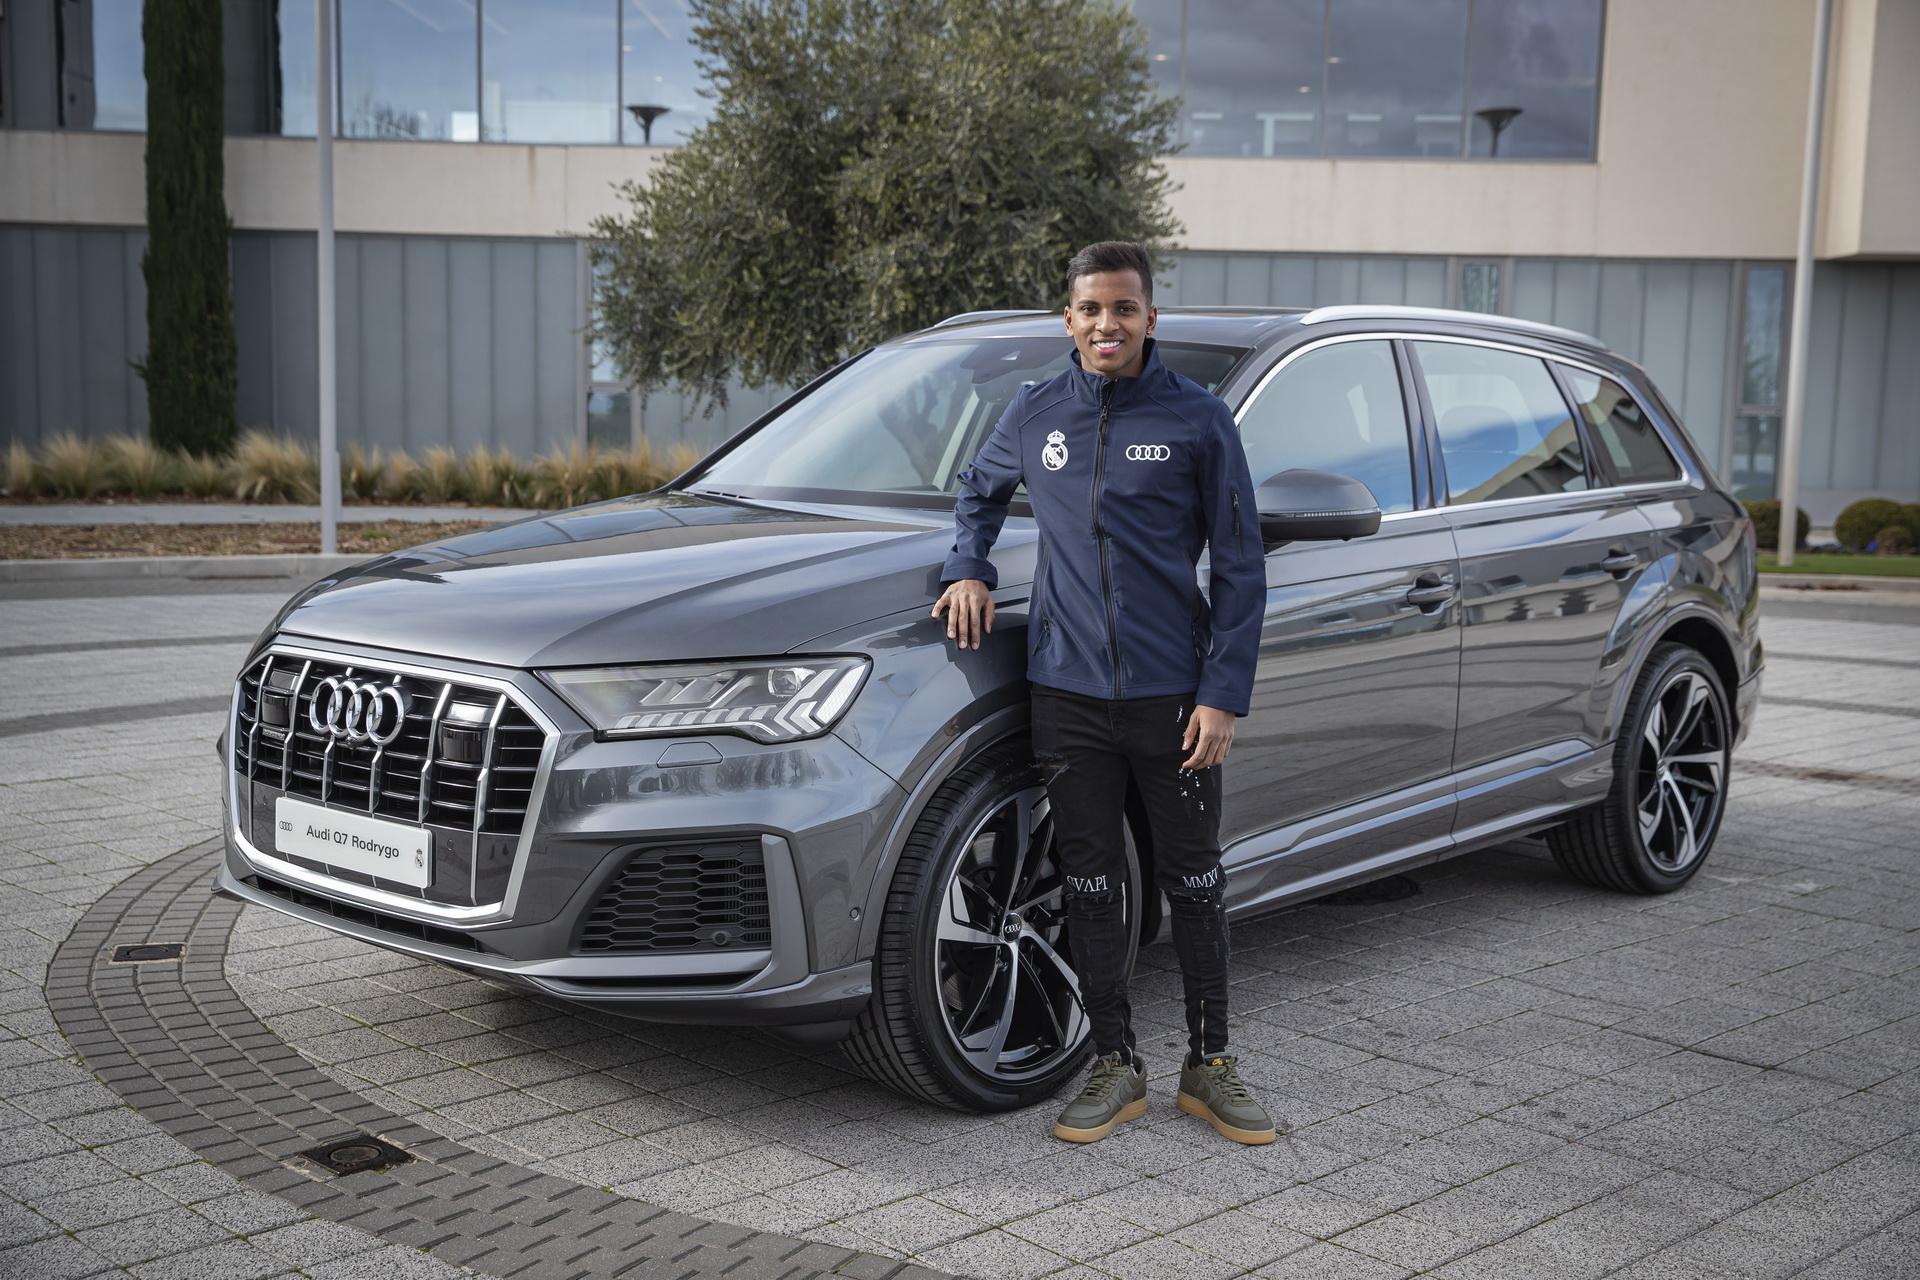 Real_Madrid_Players_Audi_0026